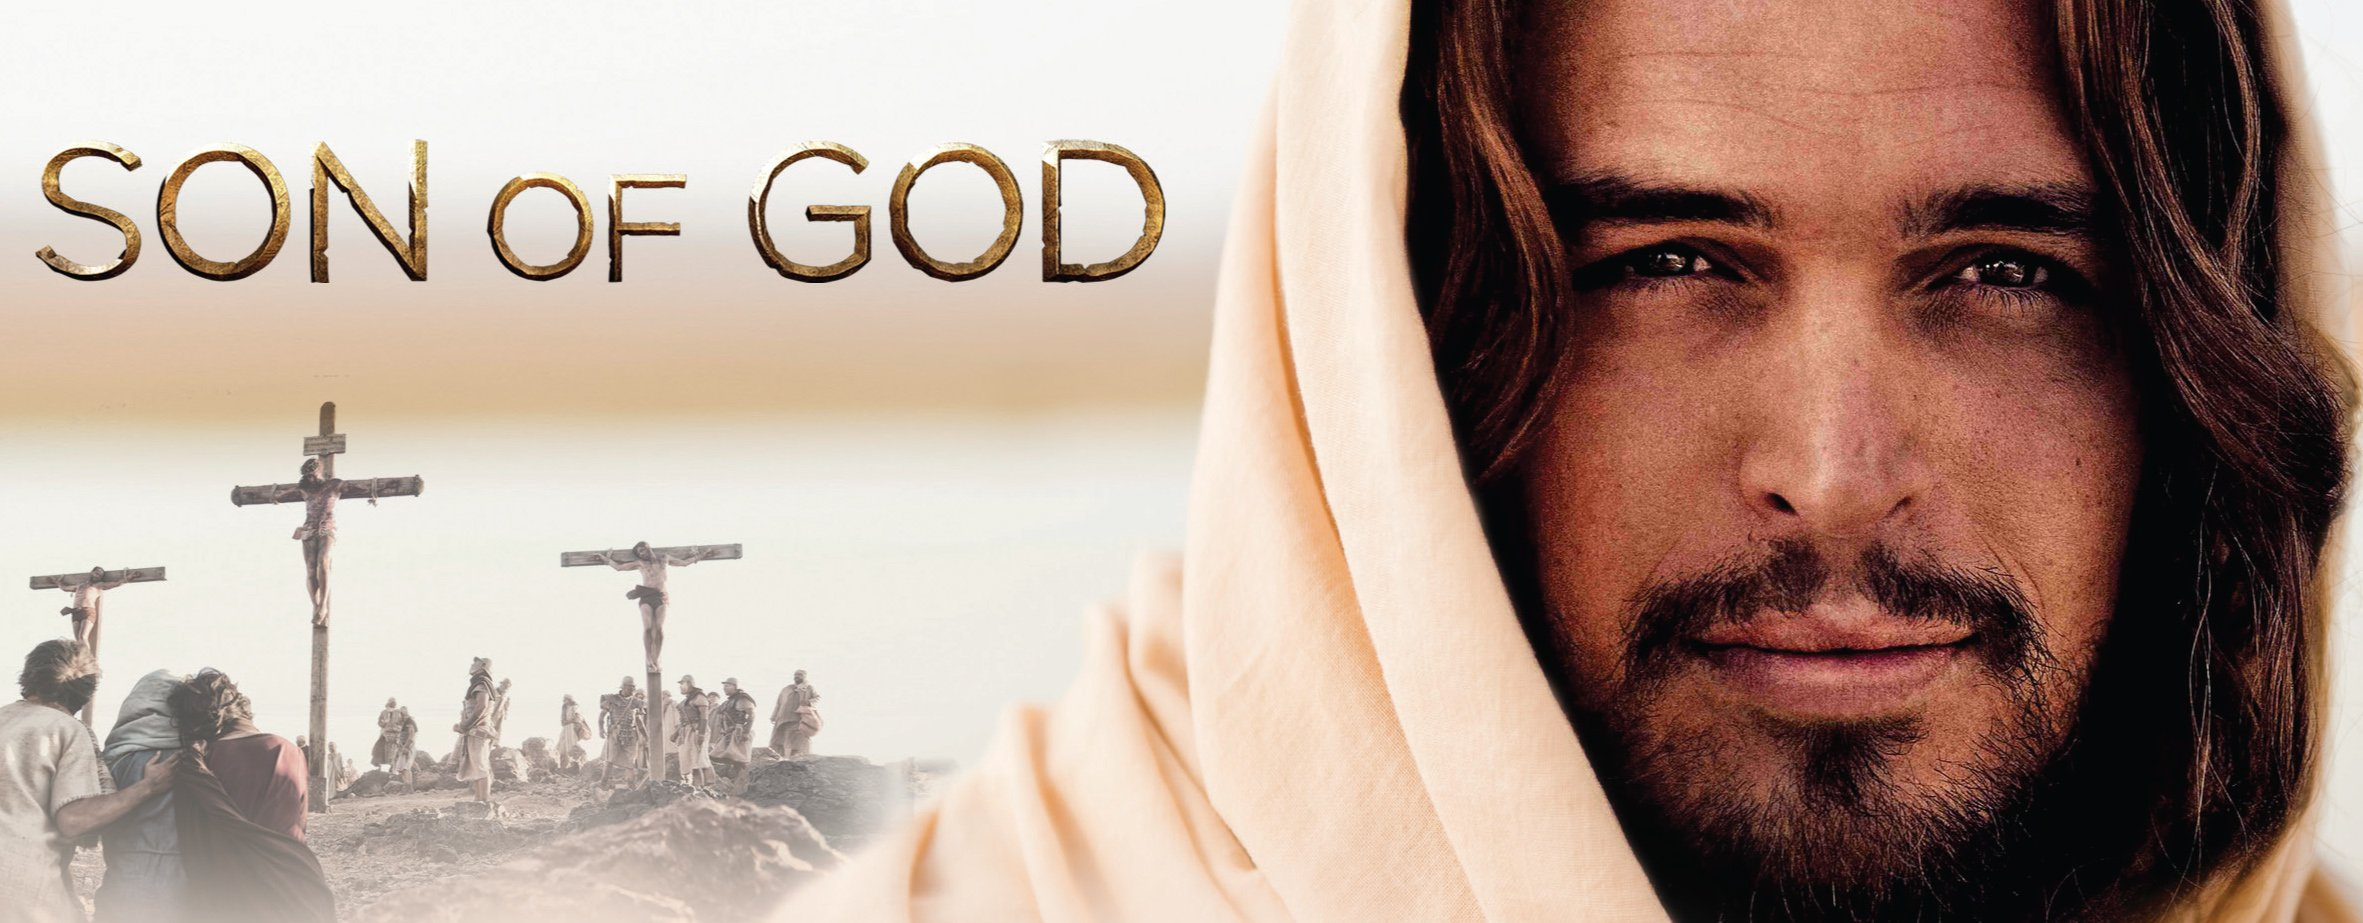 GOD drama religion movie film christian god son jesus poster wallpaper 2363x923